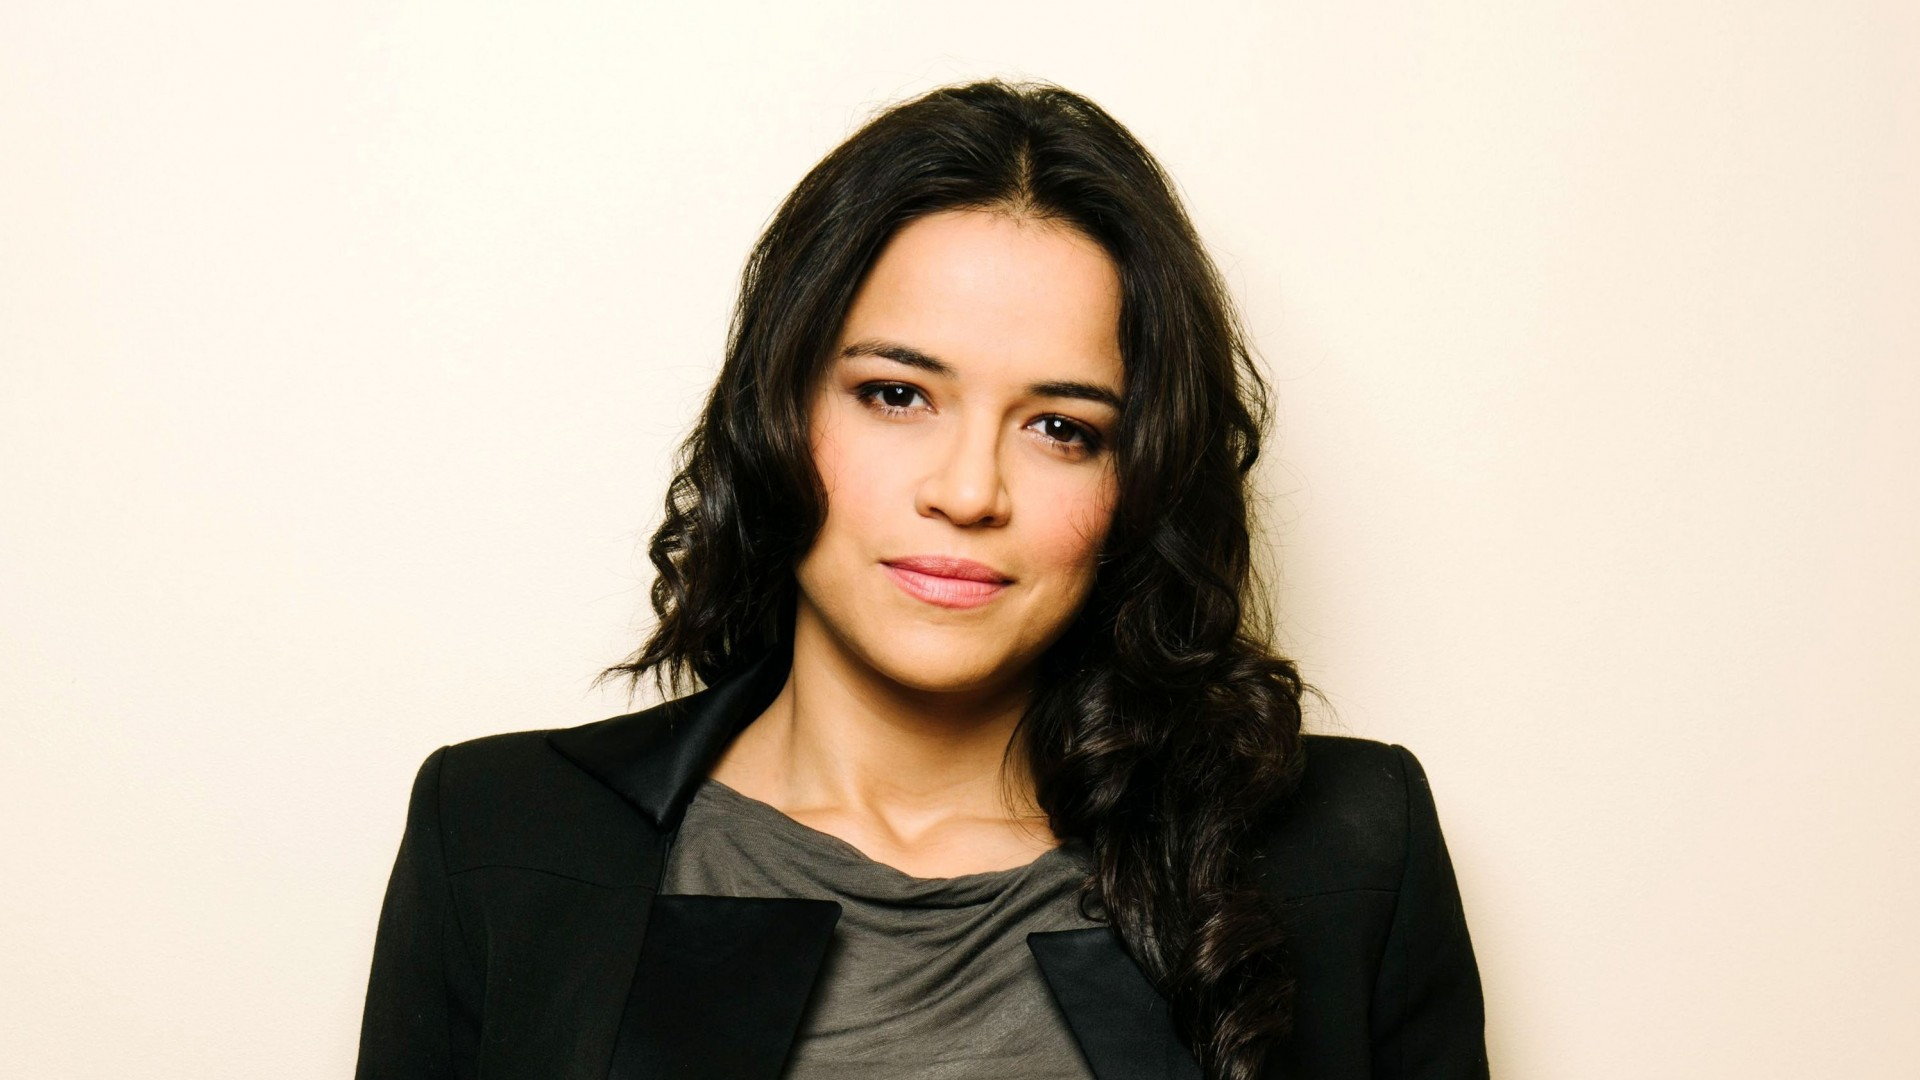 Georgina Rodriguez Hd Wallpapers Download: 14 HD Michelle Rodriguez Wallpapers